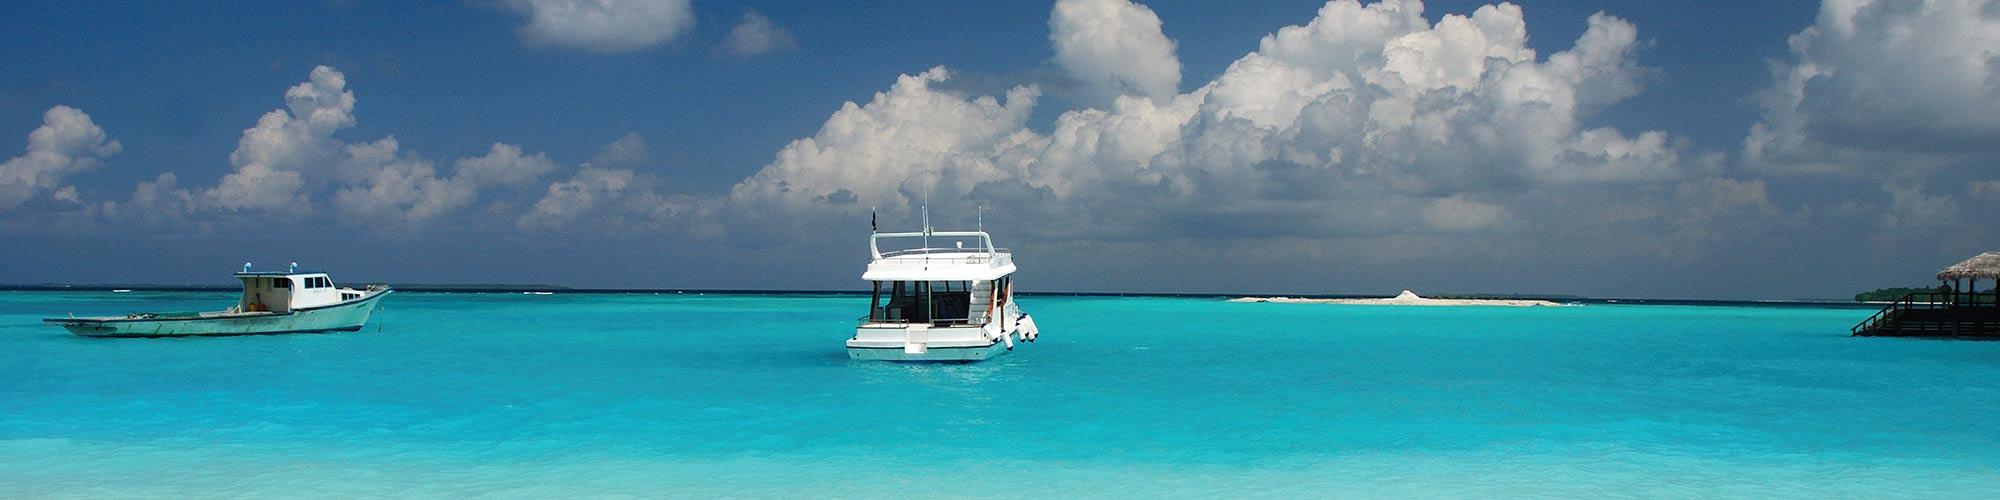 maldives-banner-2.jpg